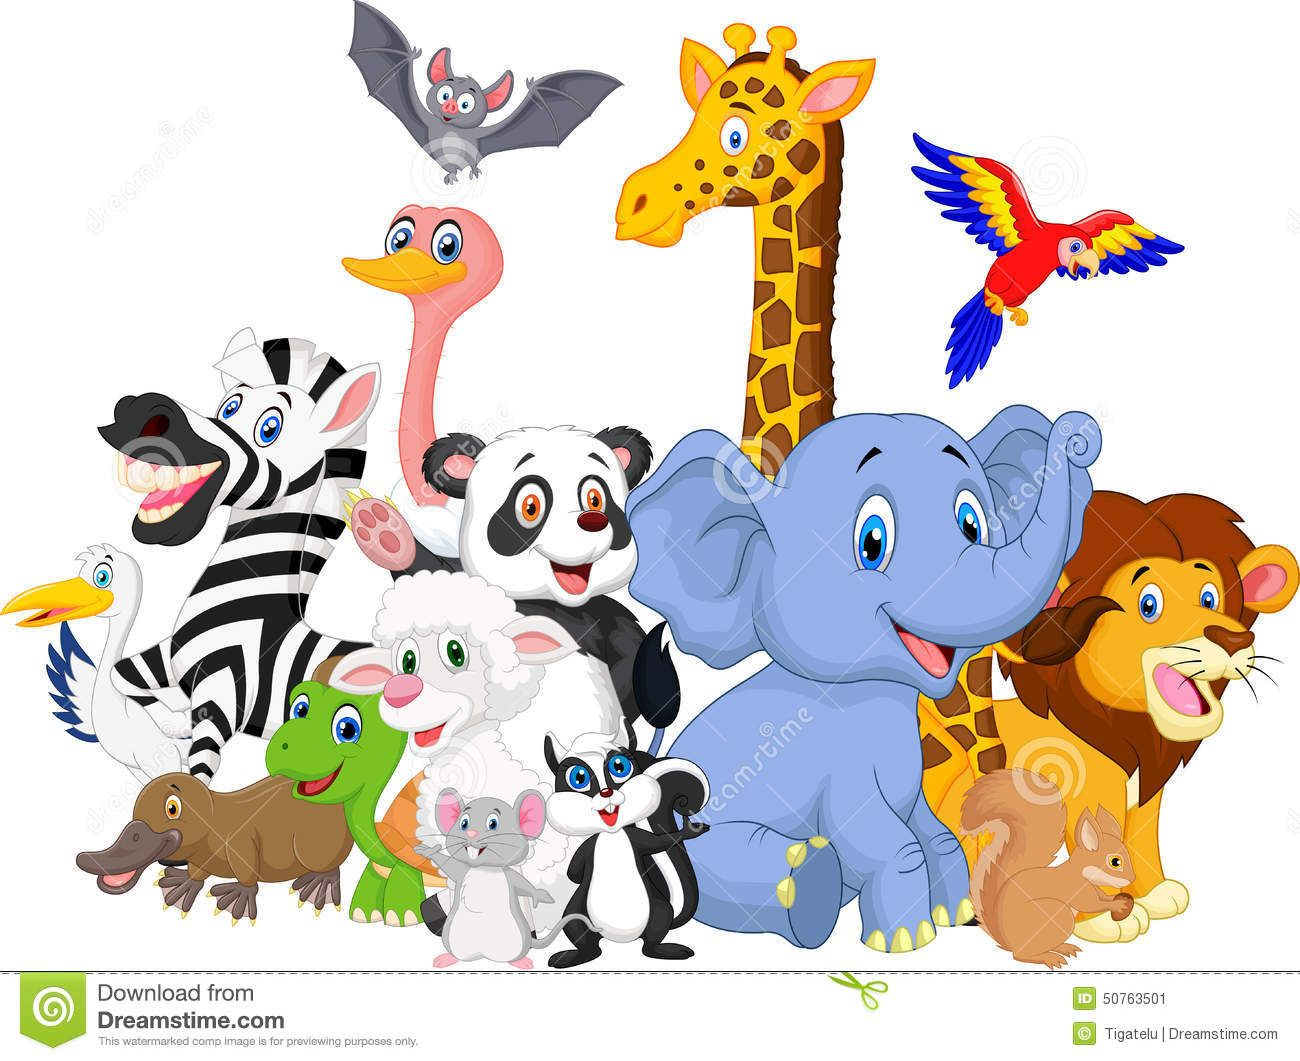 Pin by Heri siswanto on kartun Wild animals photography